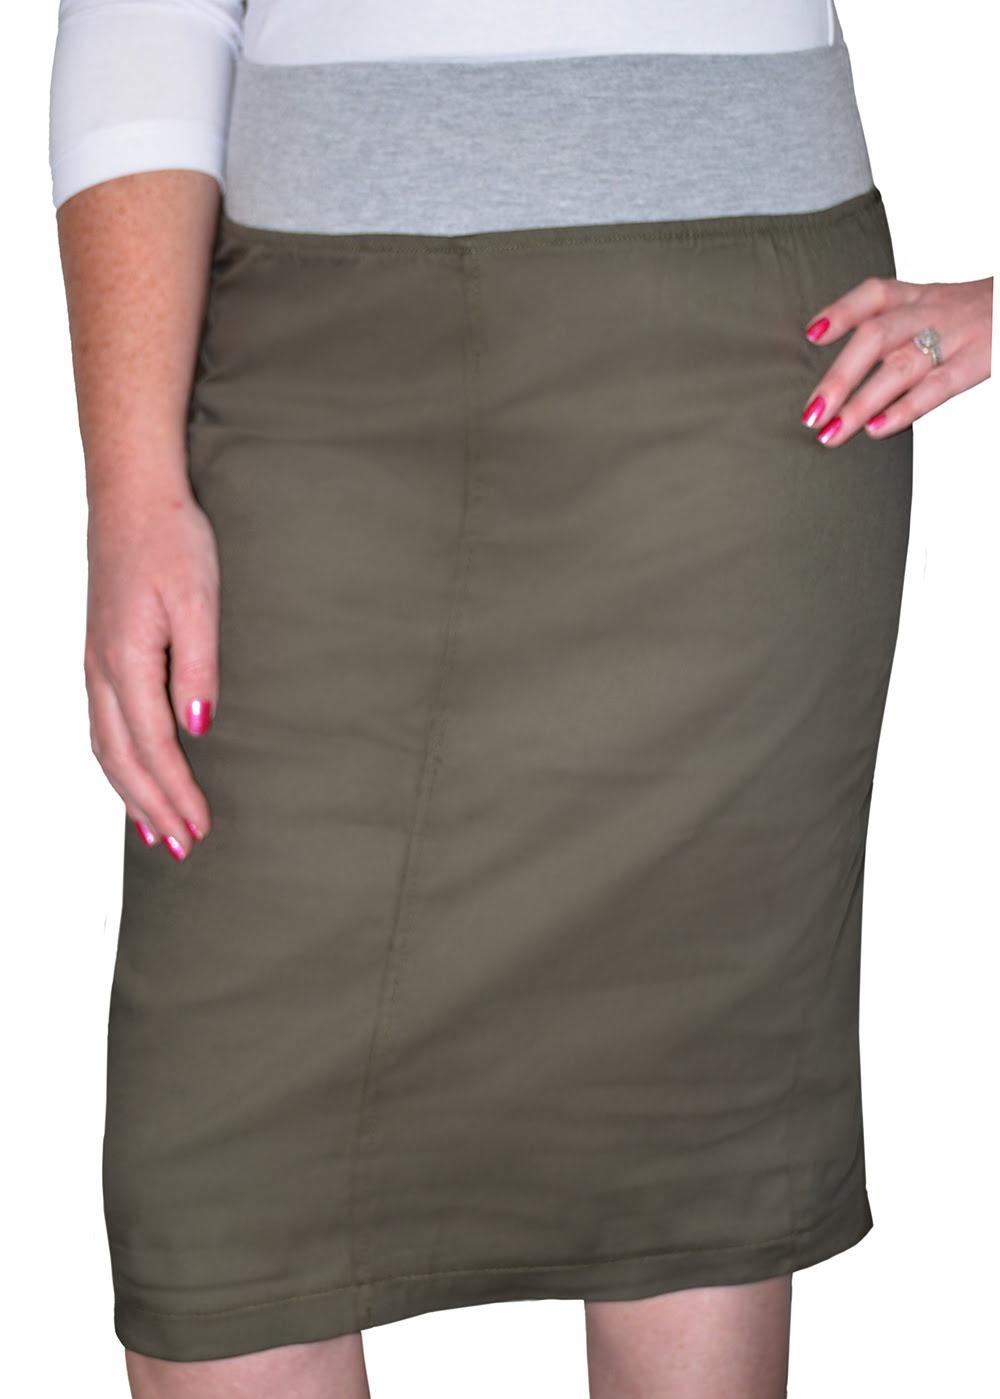 bcb75e10b26a8 1806. Twill Skirt with Comfortable Cotton Spandex Waistband